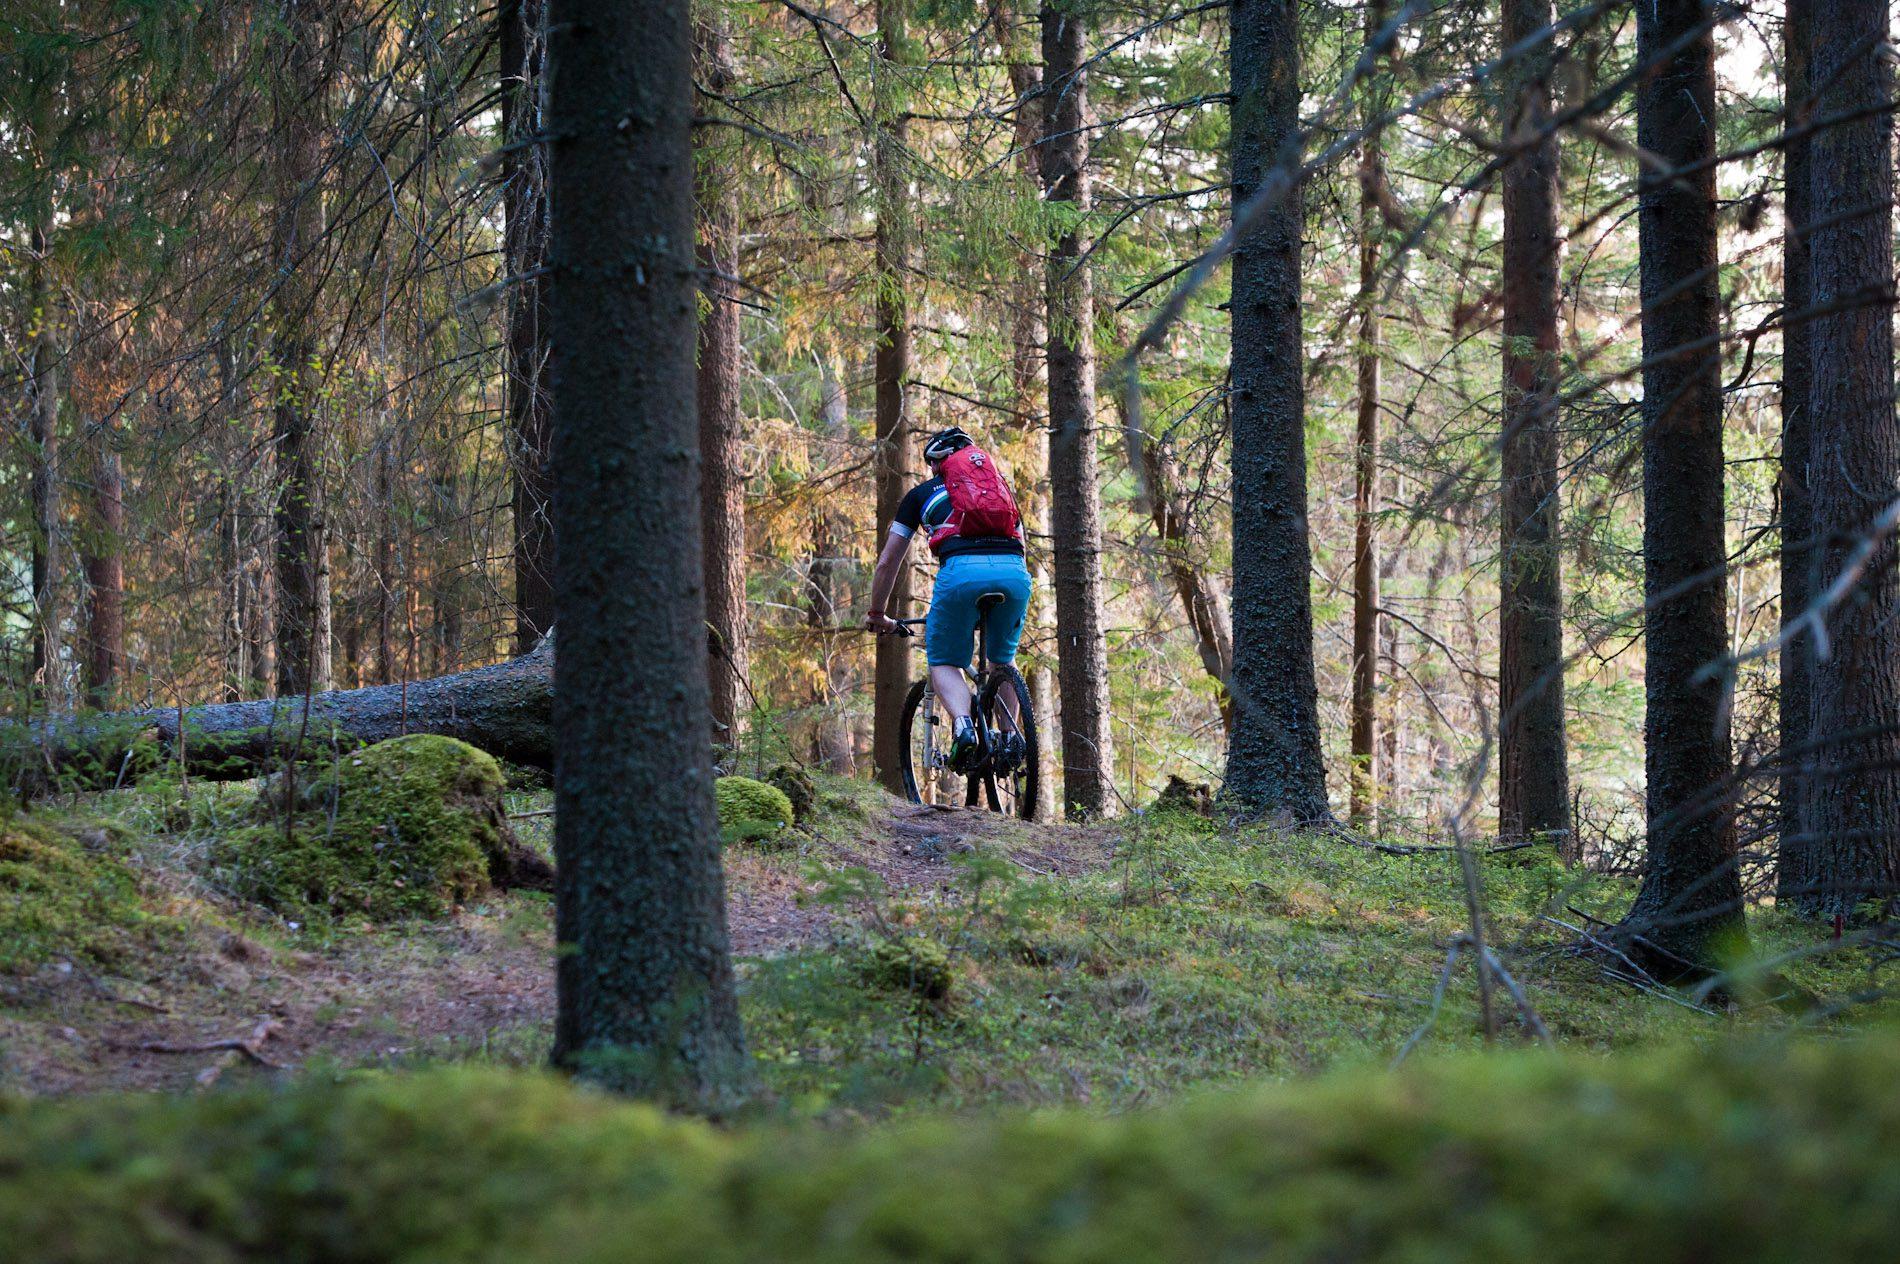 Mountainbike SM i Östersund – upplev den fina stigcyklingen i området